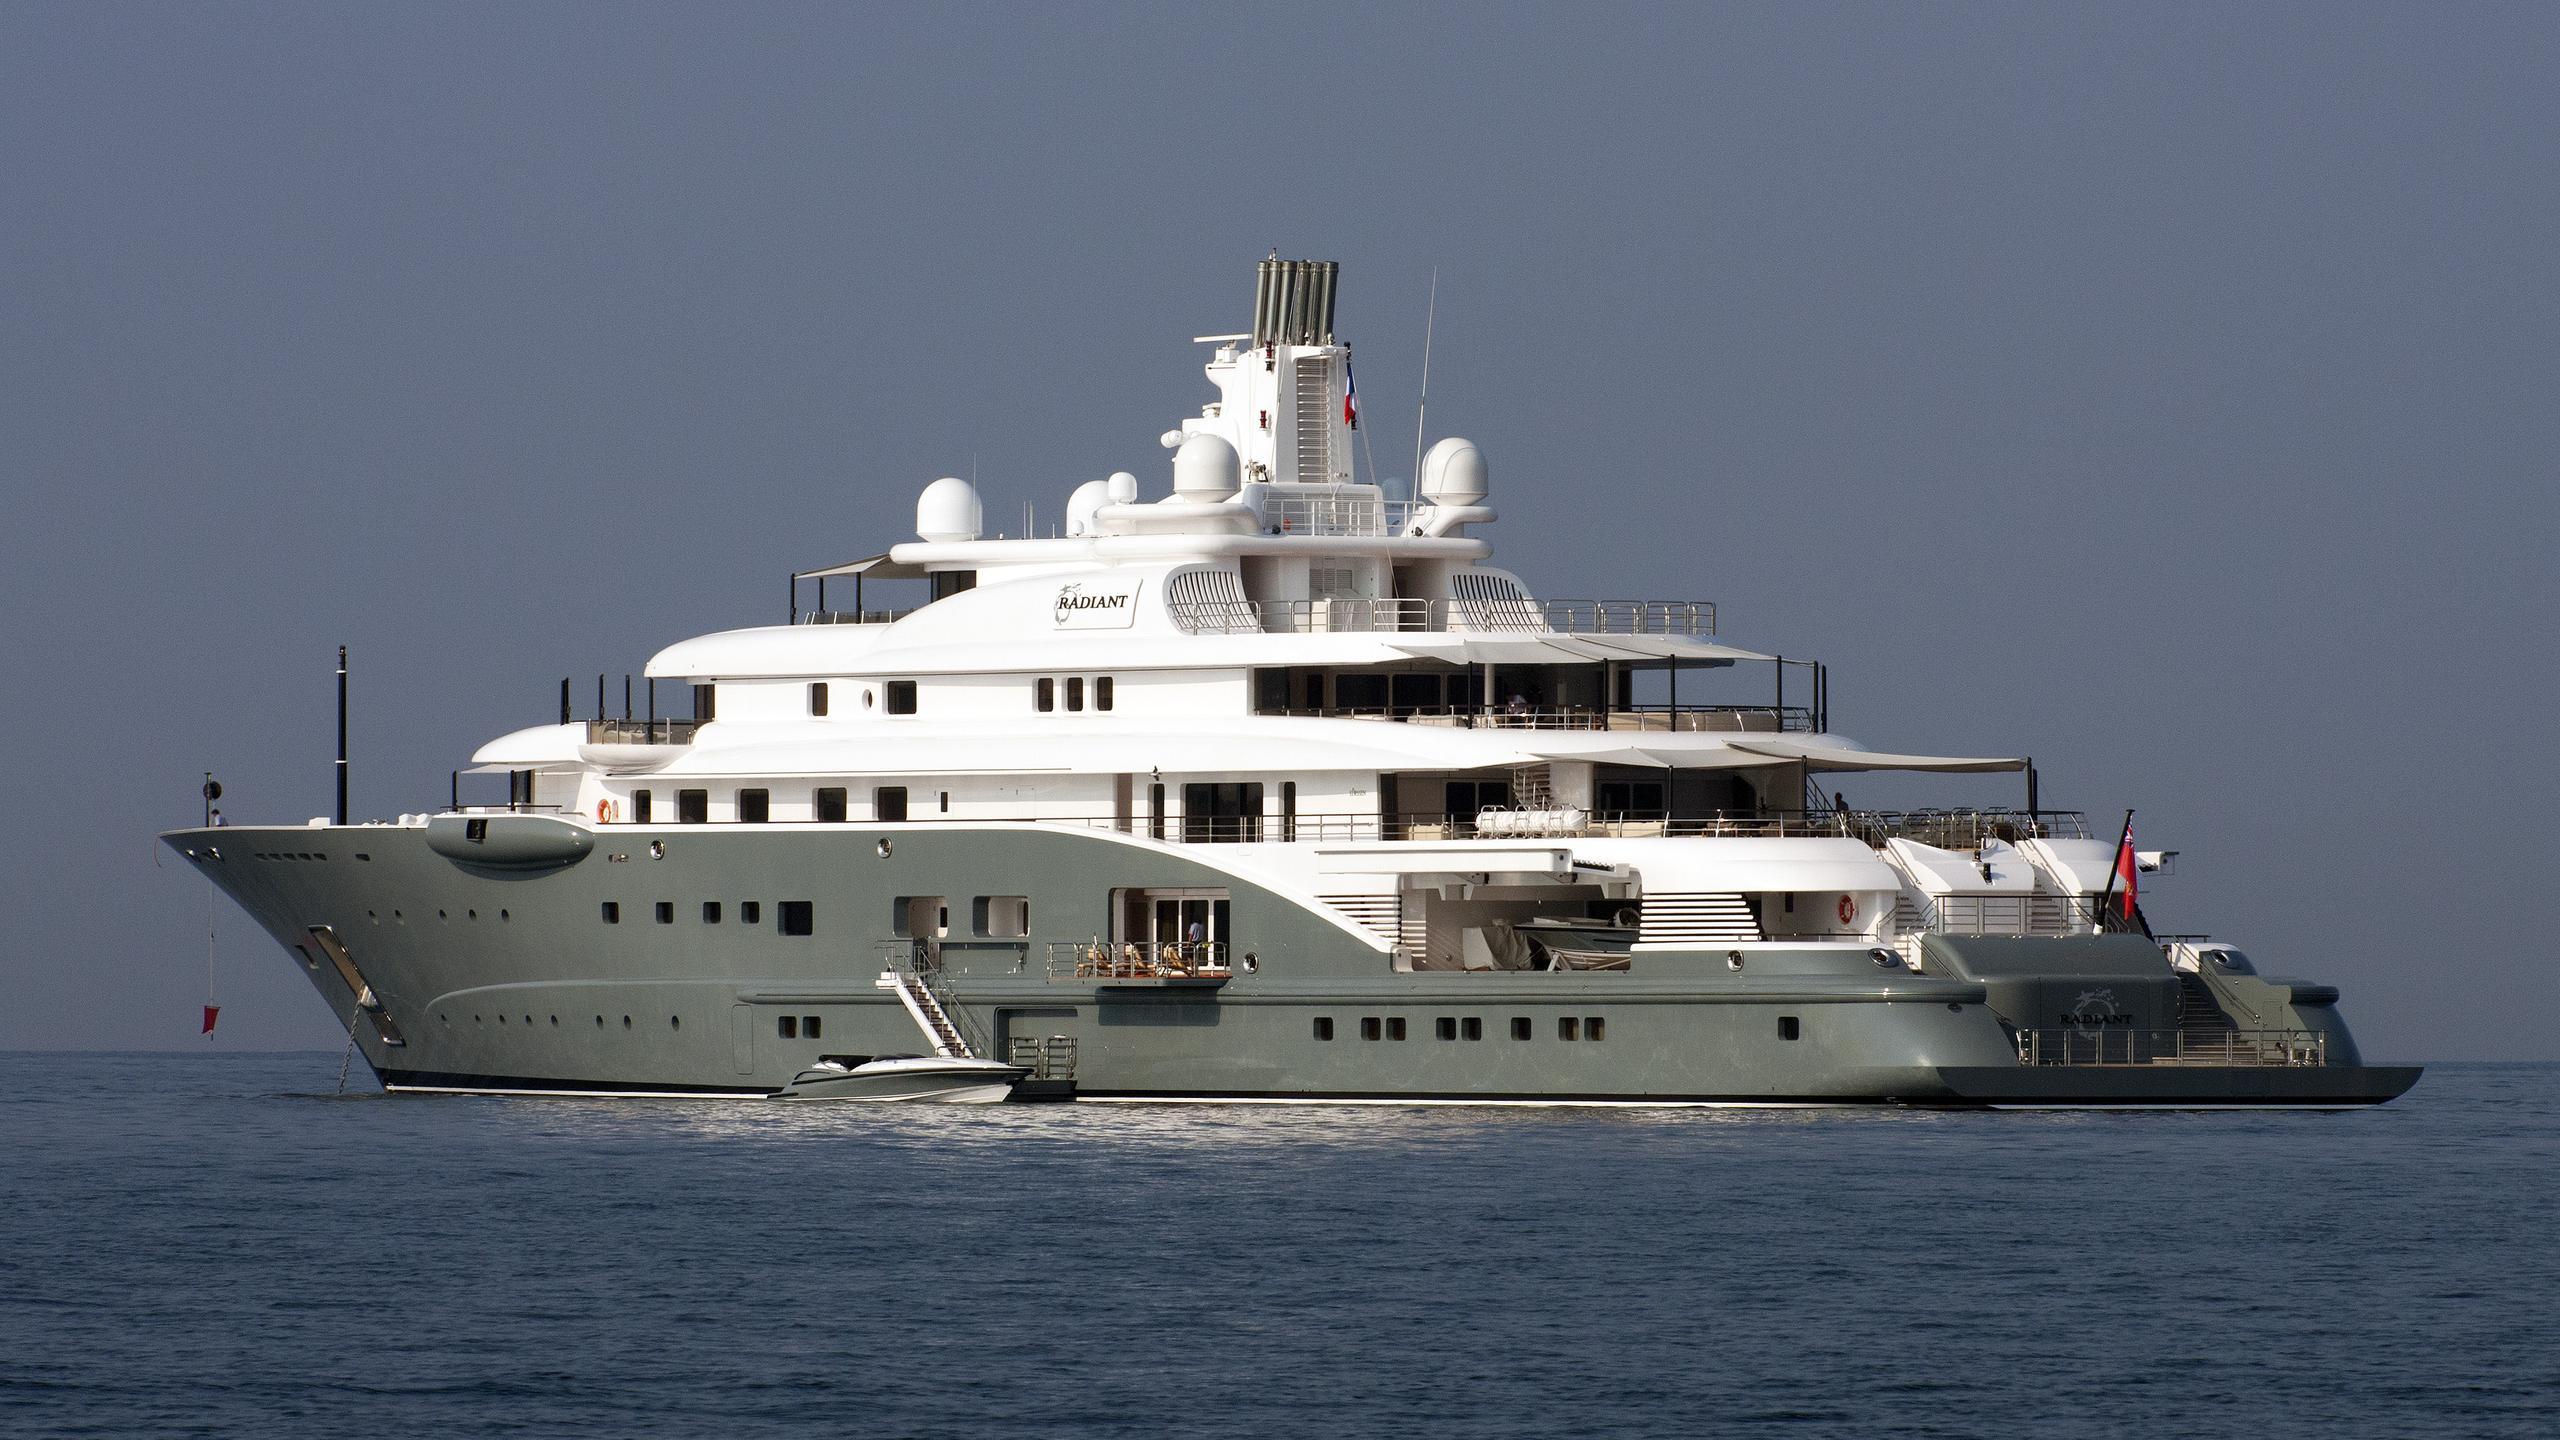 radiant-motor-yacht-lurssen-2009-110m-half-profile